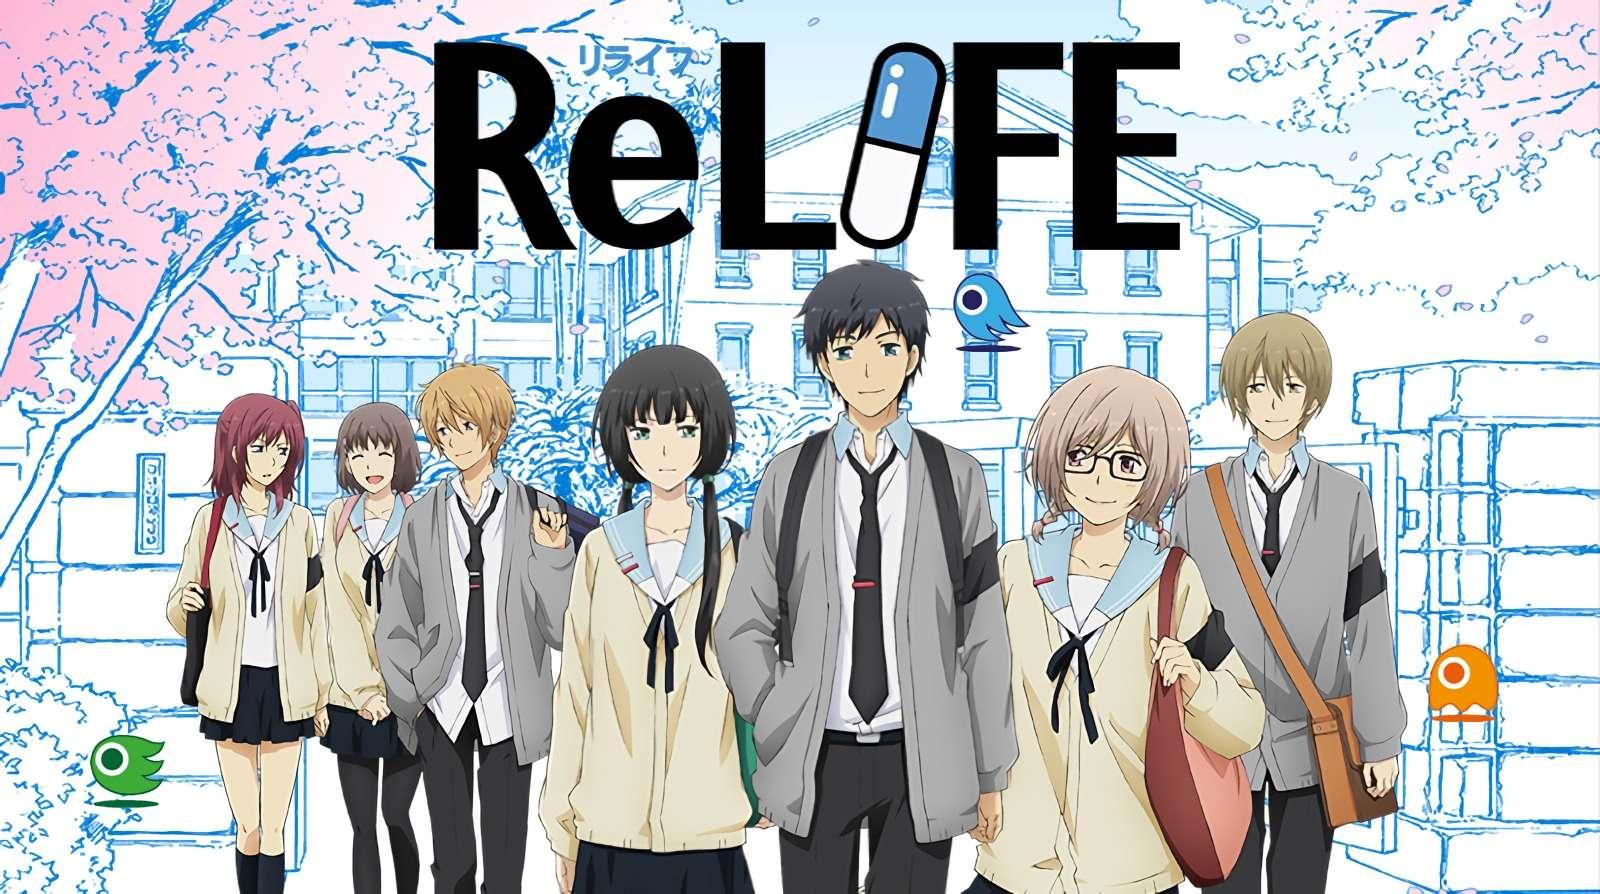 Interesting high school anime about redoing life, like Higehiro, ReLIFE